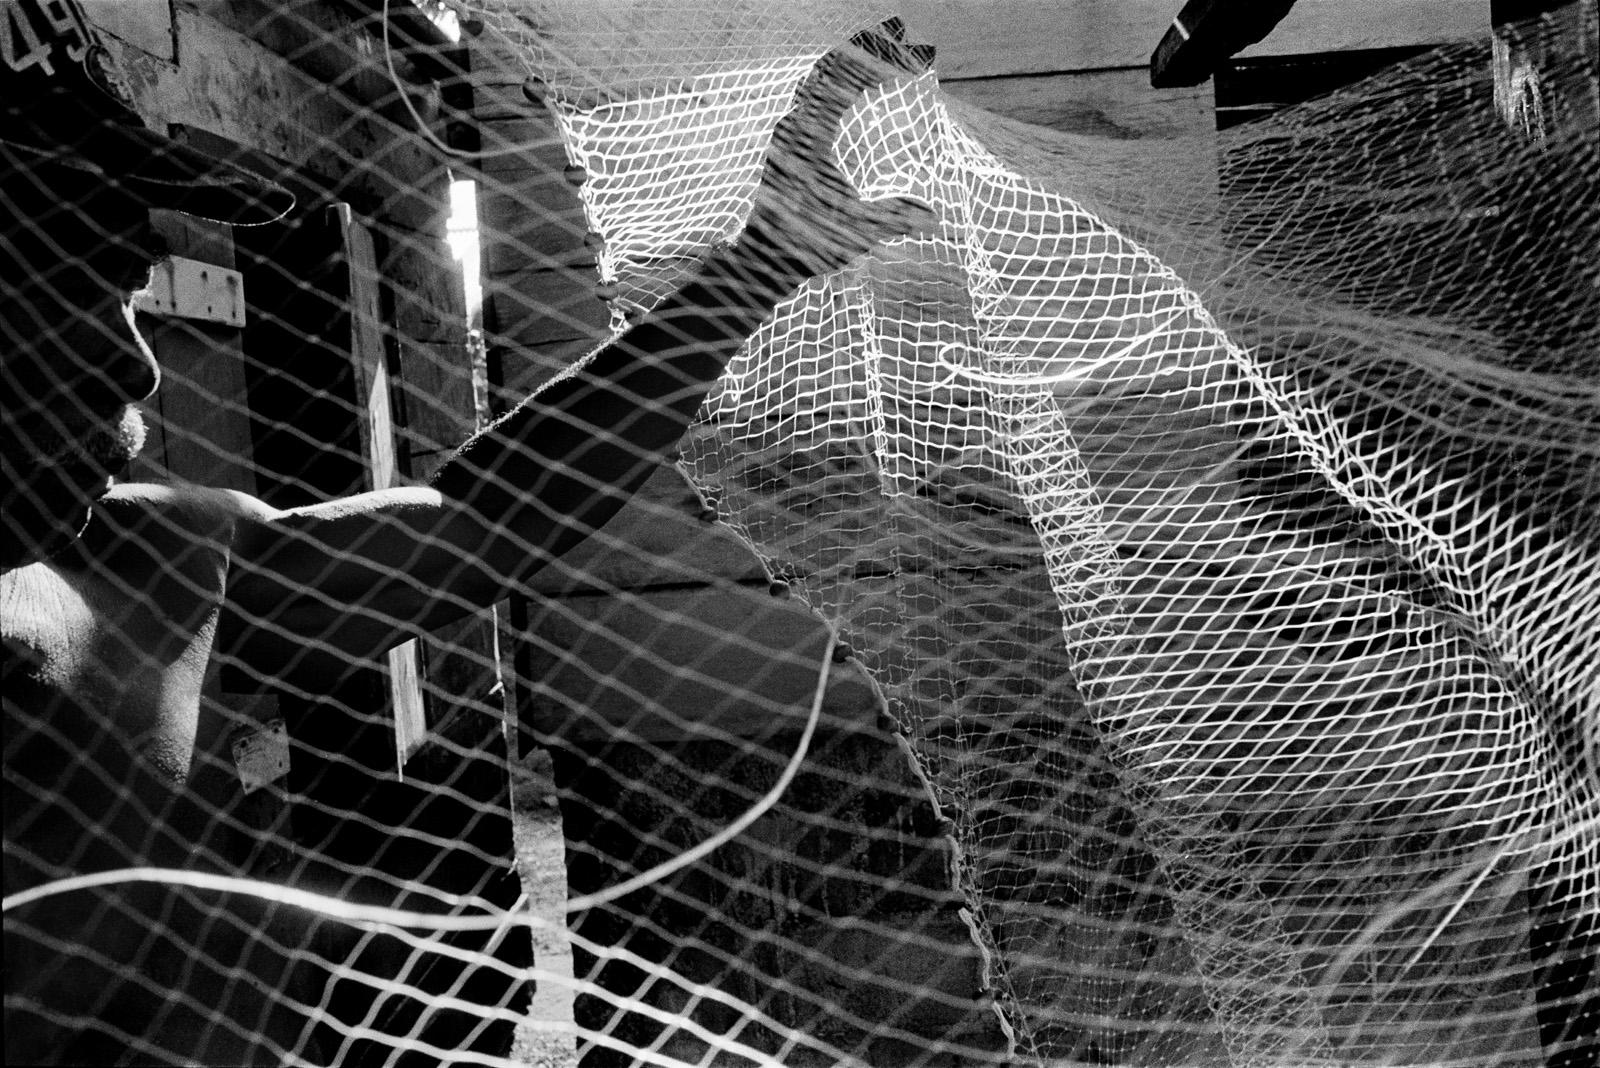 08stella johnson-nicaragua.jpg